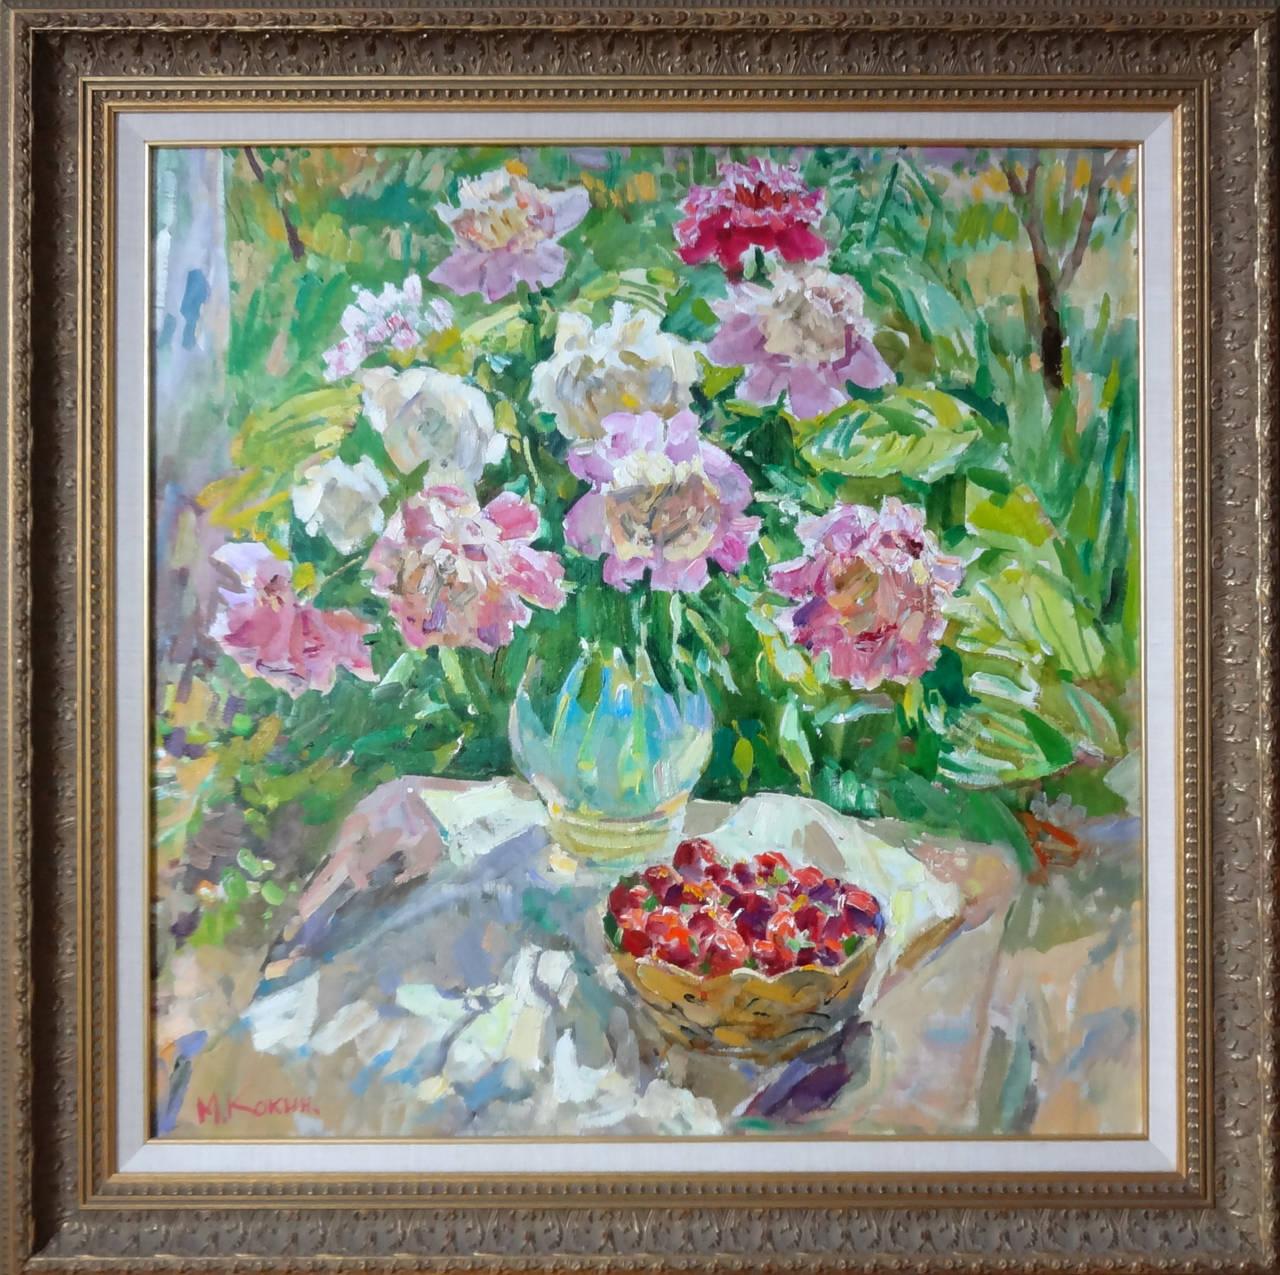 The Strawberry Basket (El Cesto de Fresas) - Painting by Mikhail Kokin